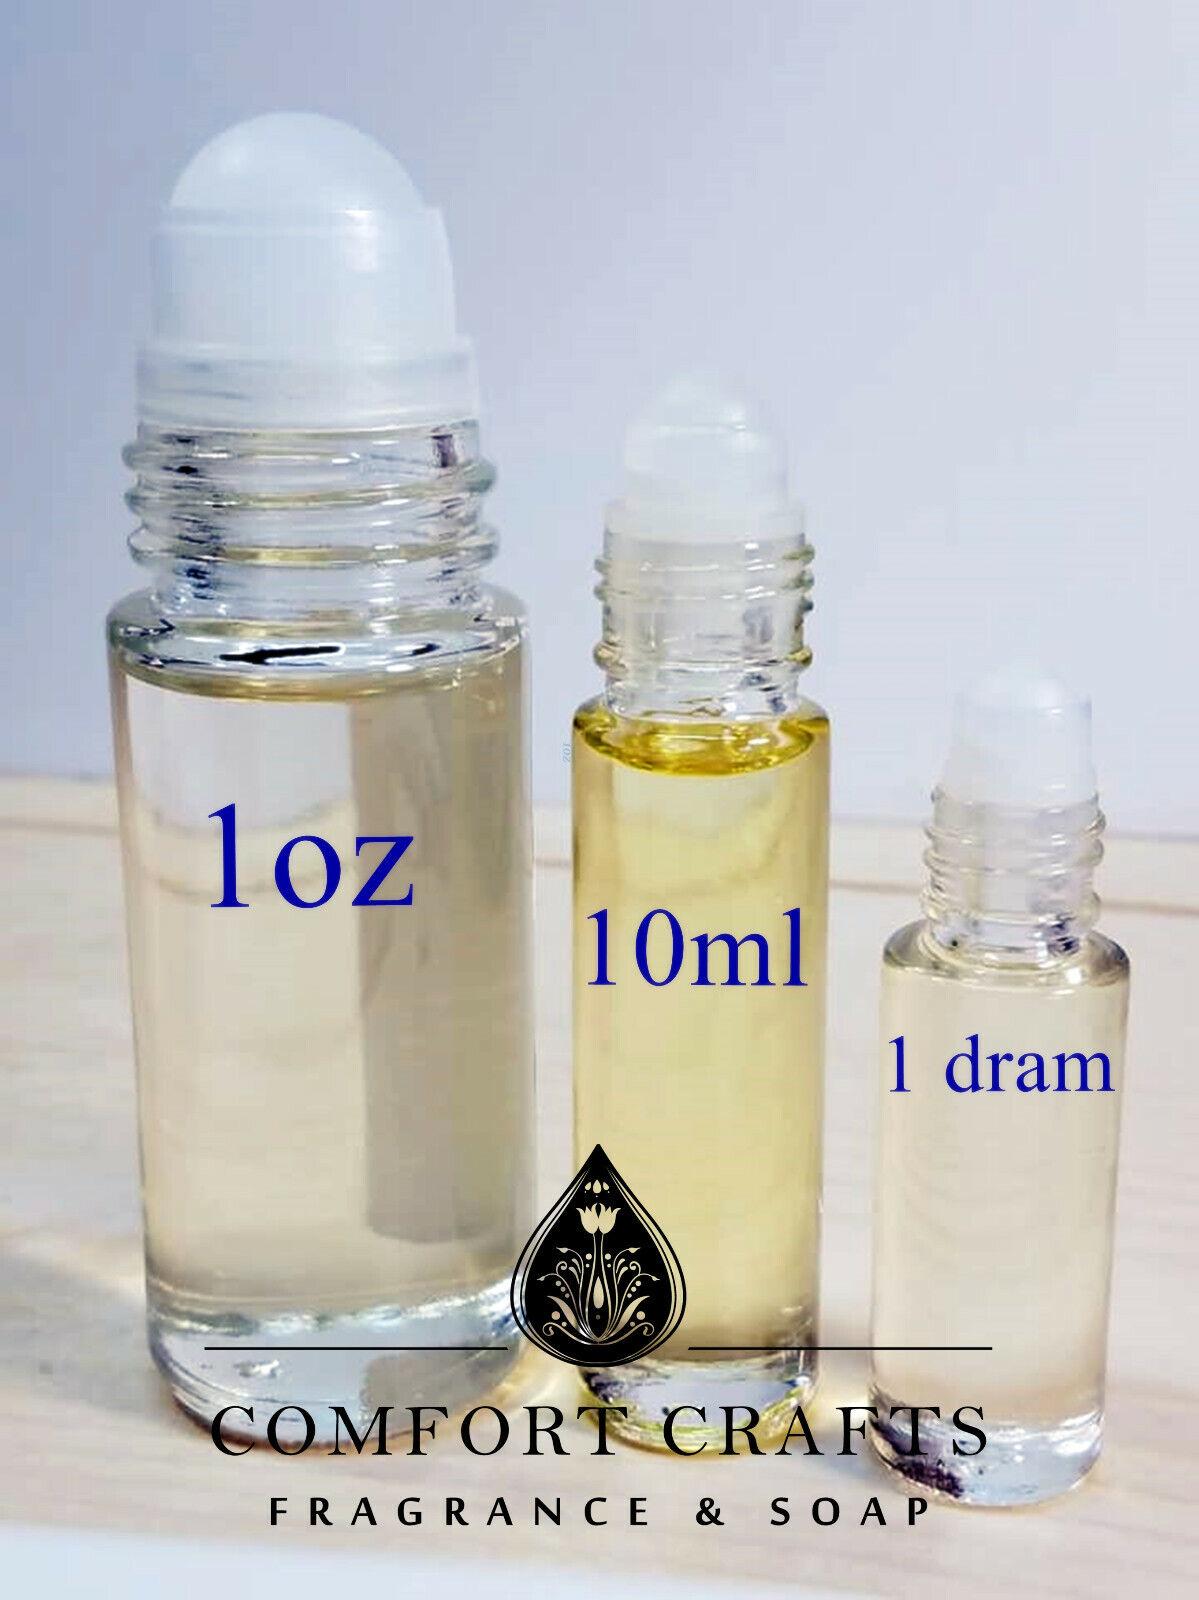 WOMEN'S FRAGRANCES Rollon Perfume Body Oils 1 dram / 10ml /